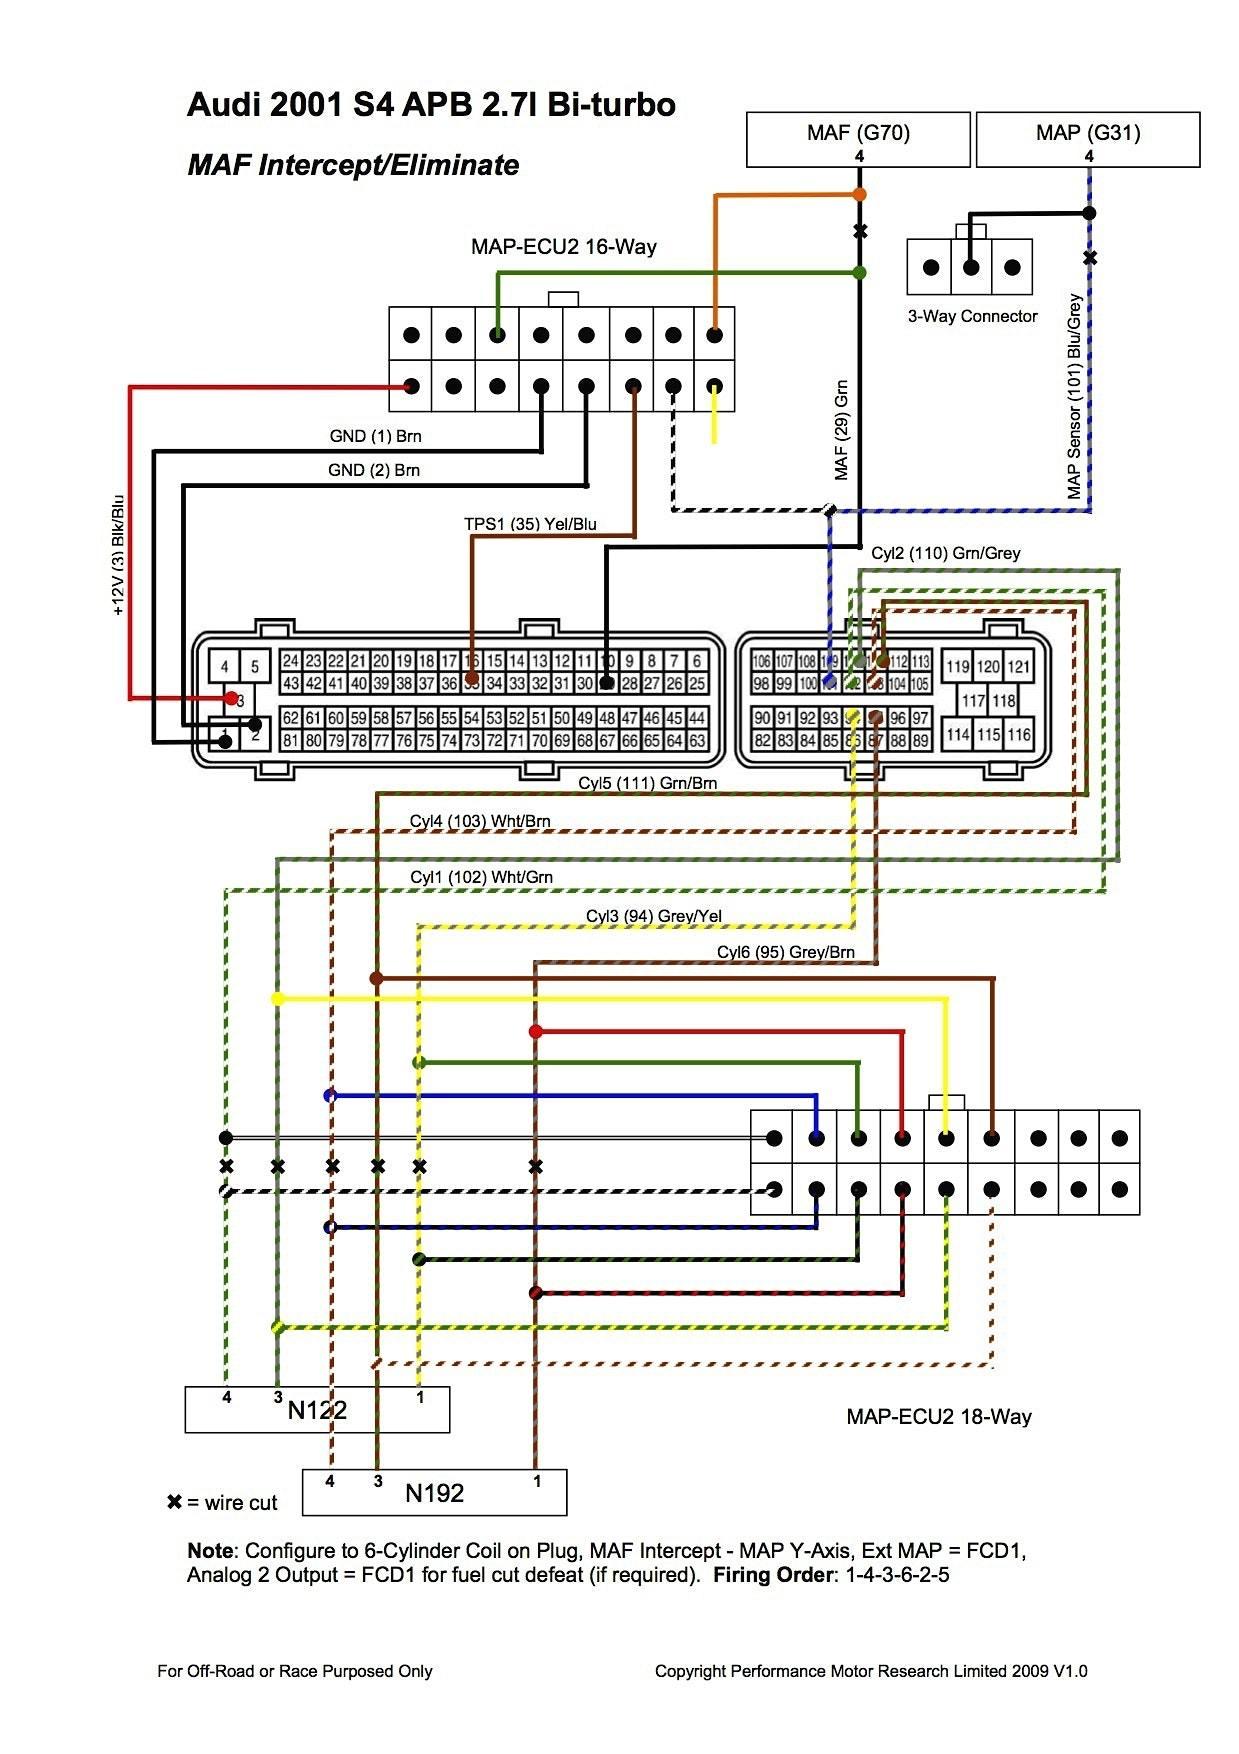 97 jetta wiring diagram wiring diagram blog mix 97 jetta wiring diagrams wiring diagram view 97 radio